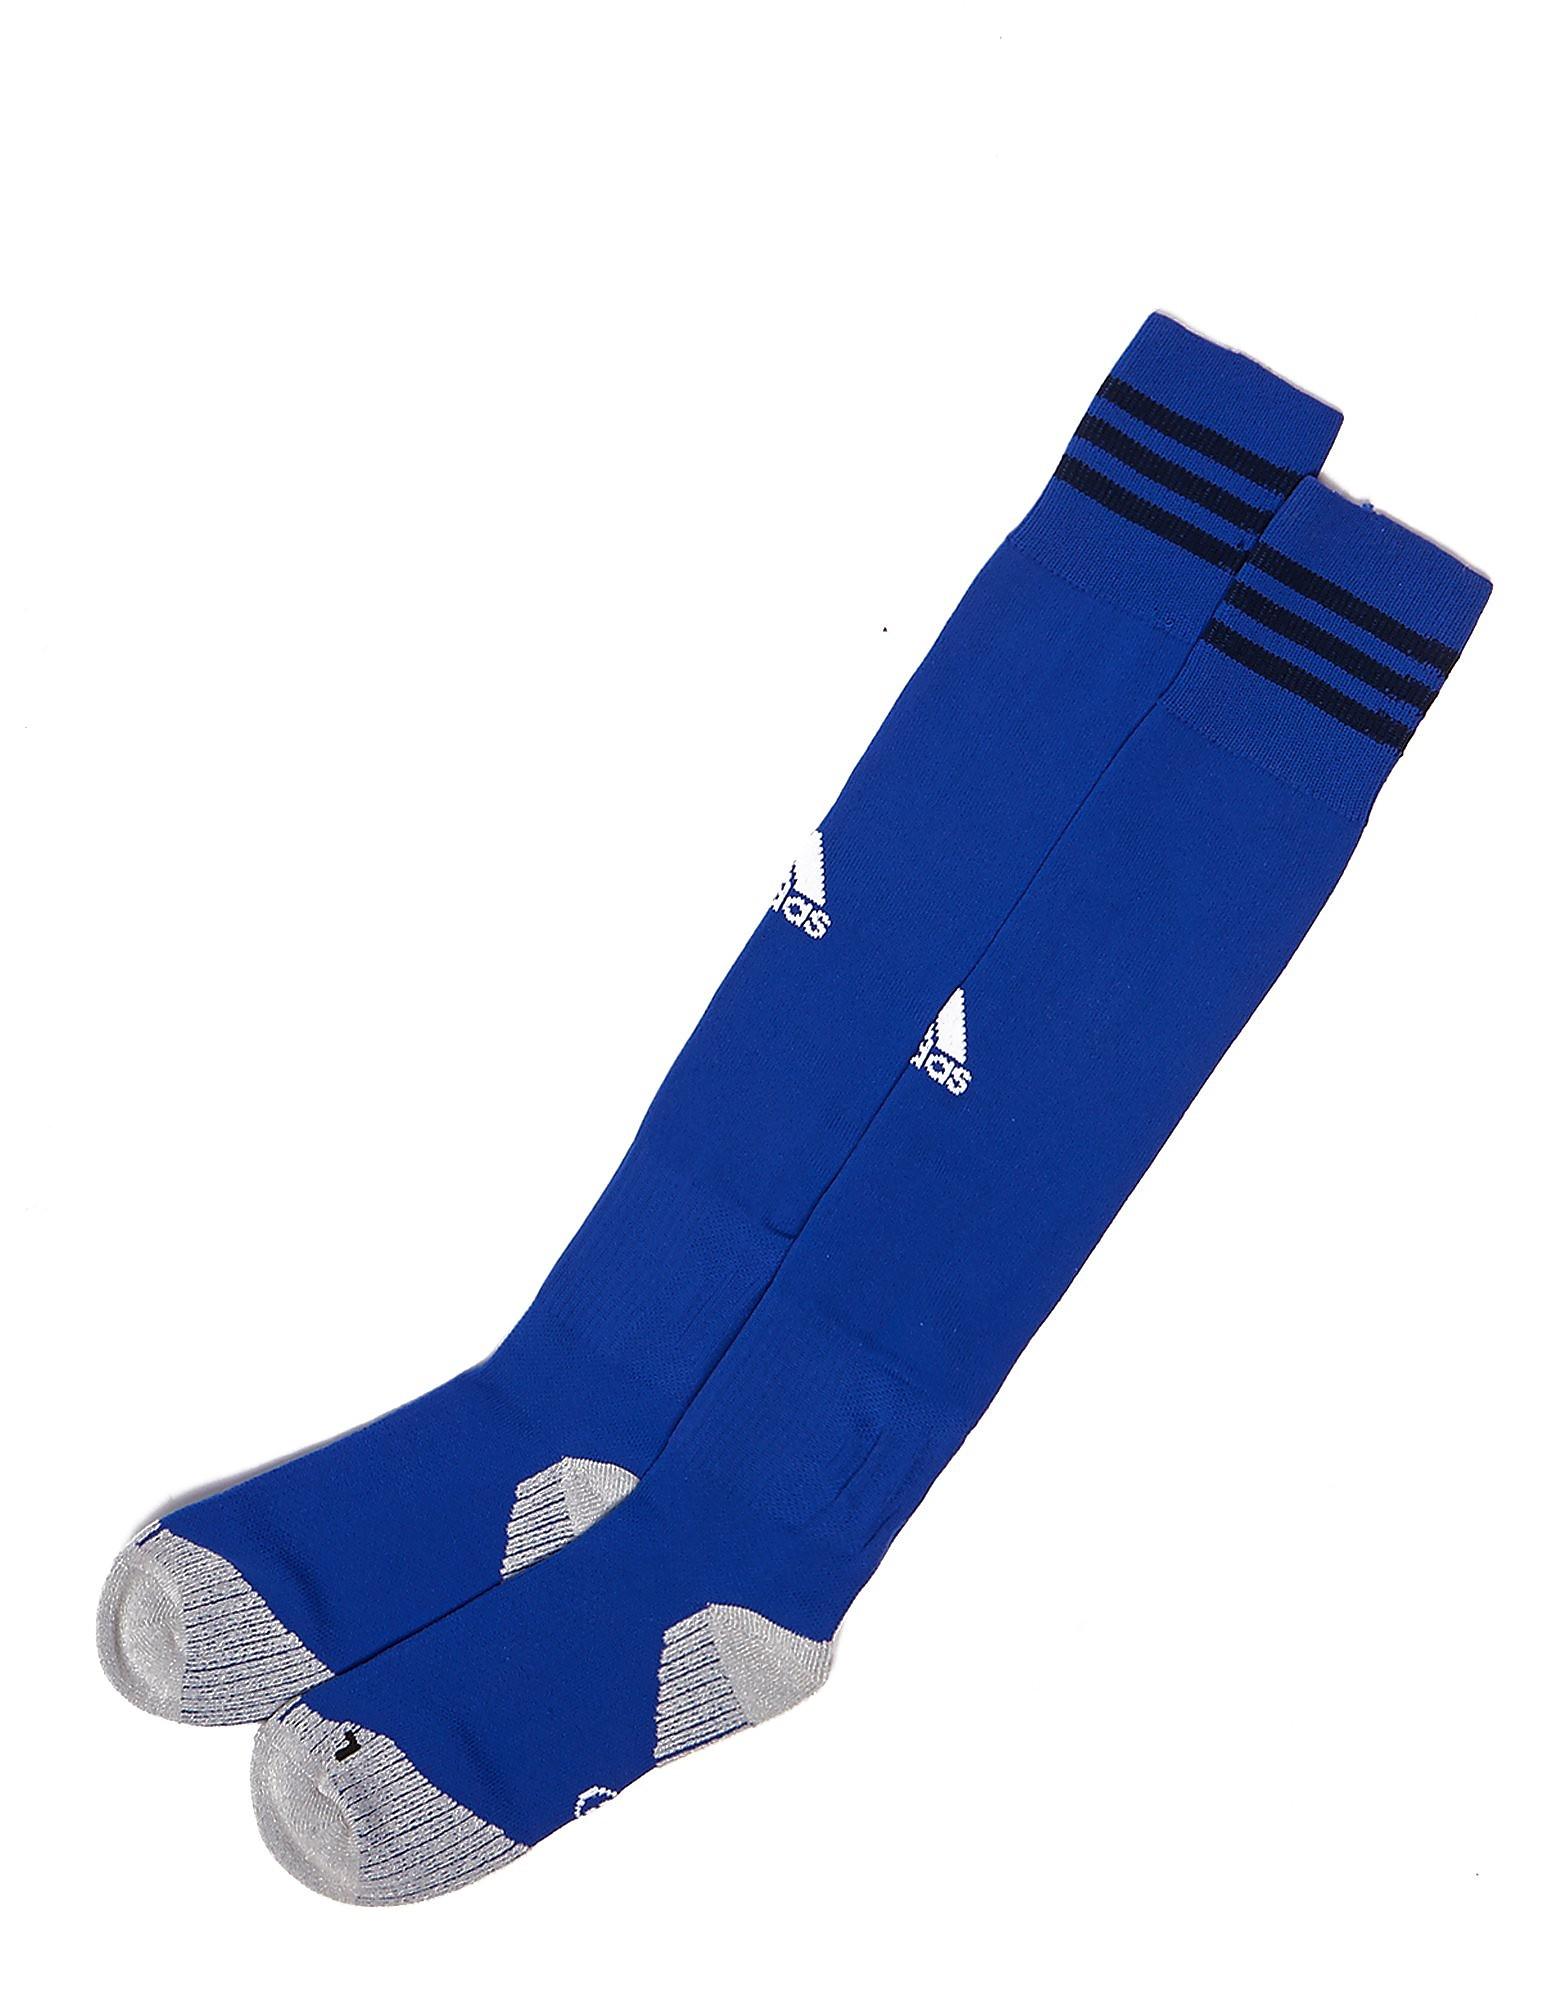 adidas Cardiff City 2017/18 Home Socks